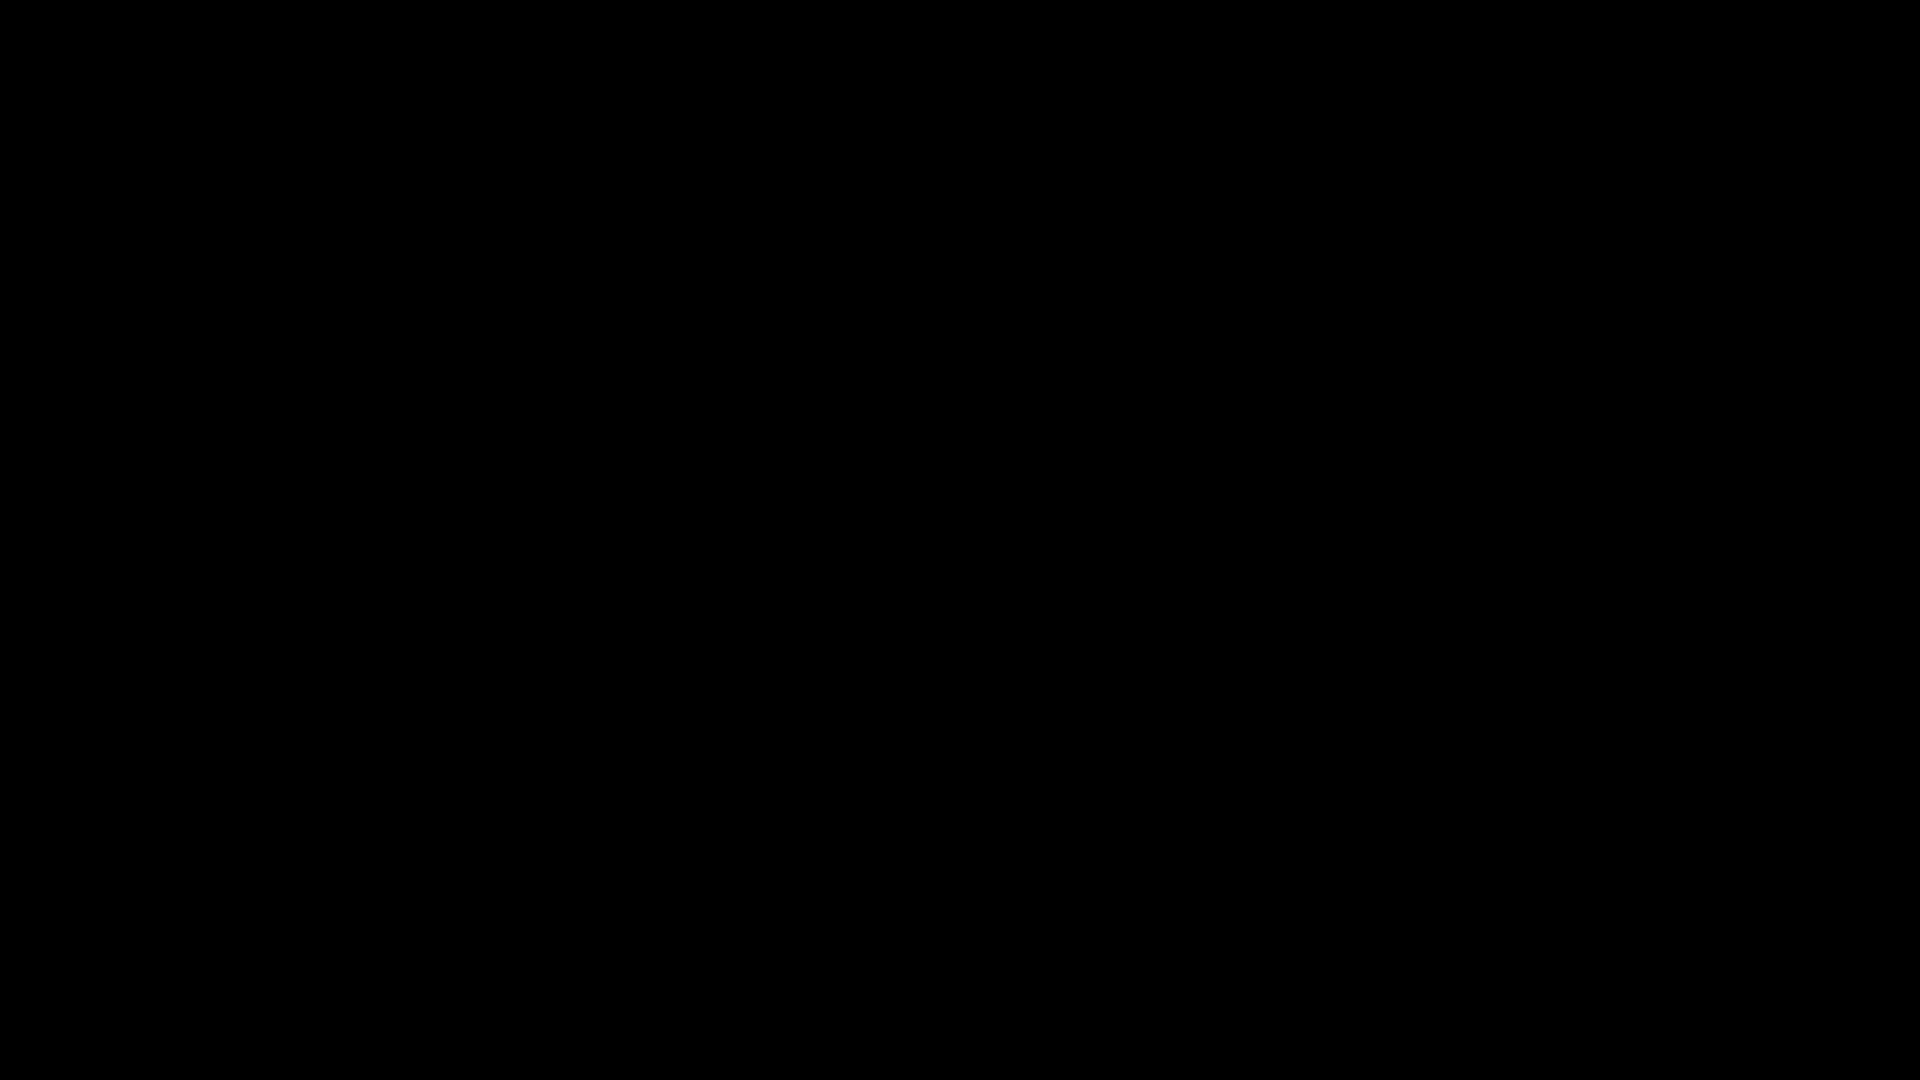 Icue Nexus コンパニオンタッチスクリーン